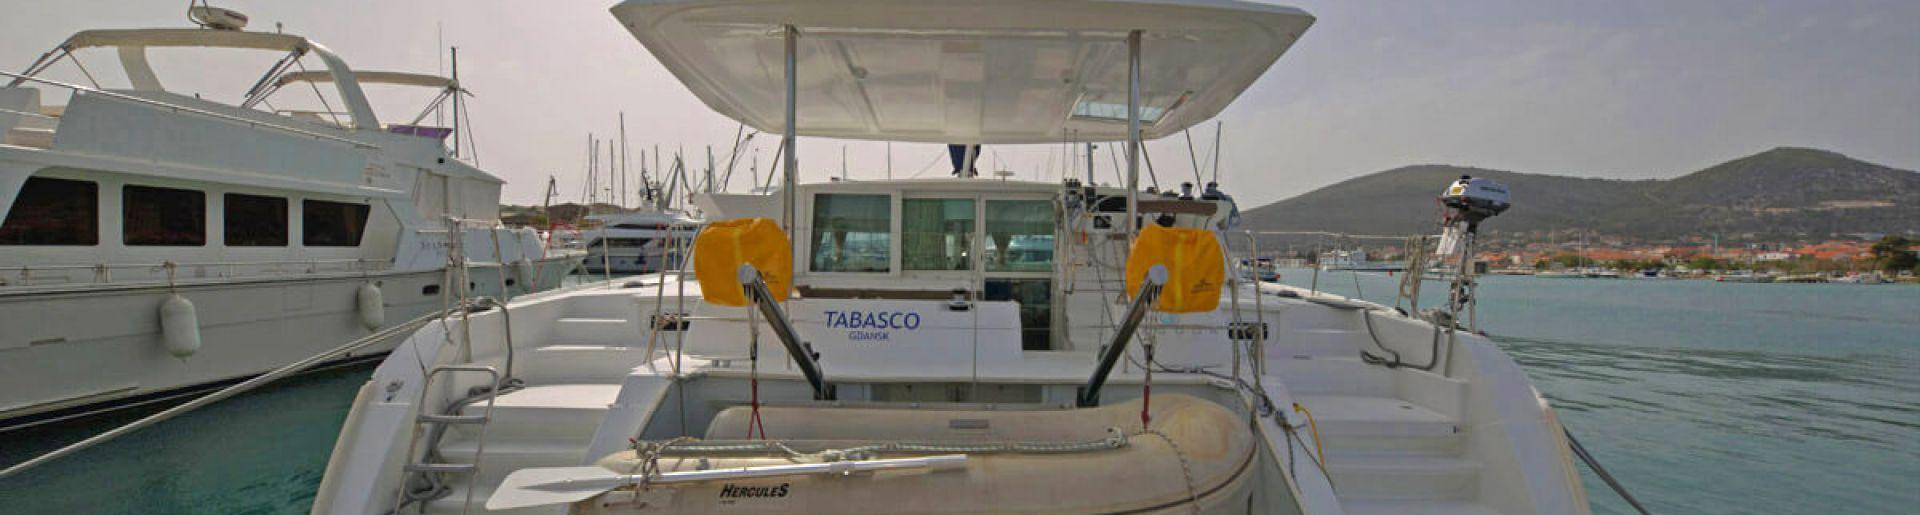 "Lagoon 420 ""Tabasco"""